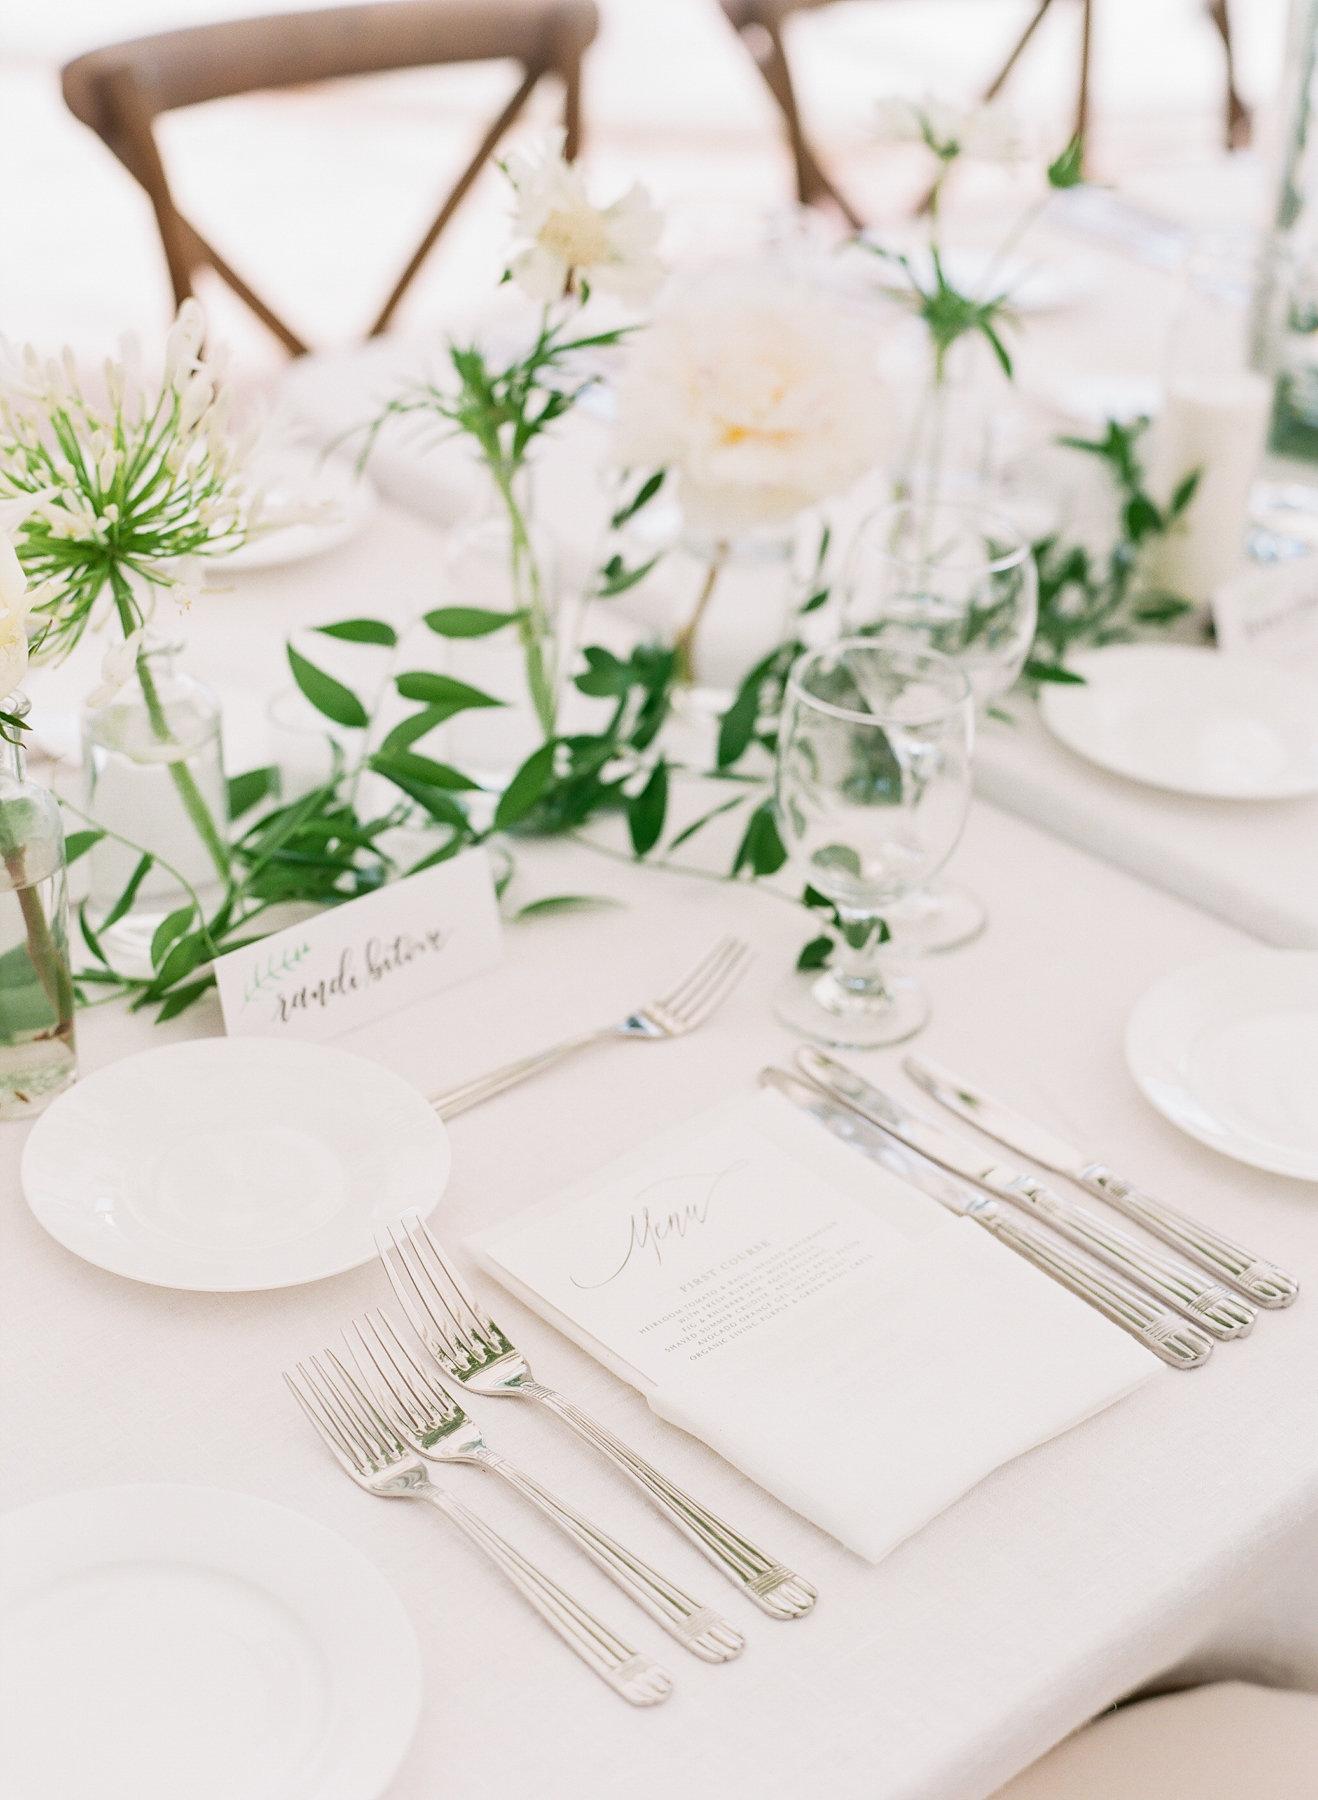 0833-maggiebrett-private-estate-wedding-000006340007.jpg